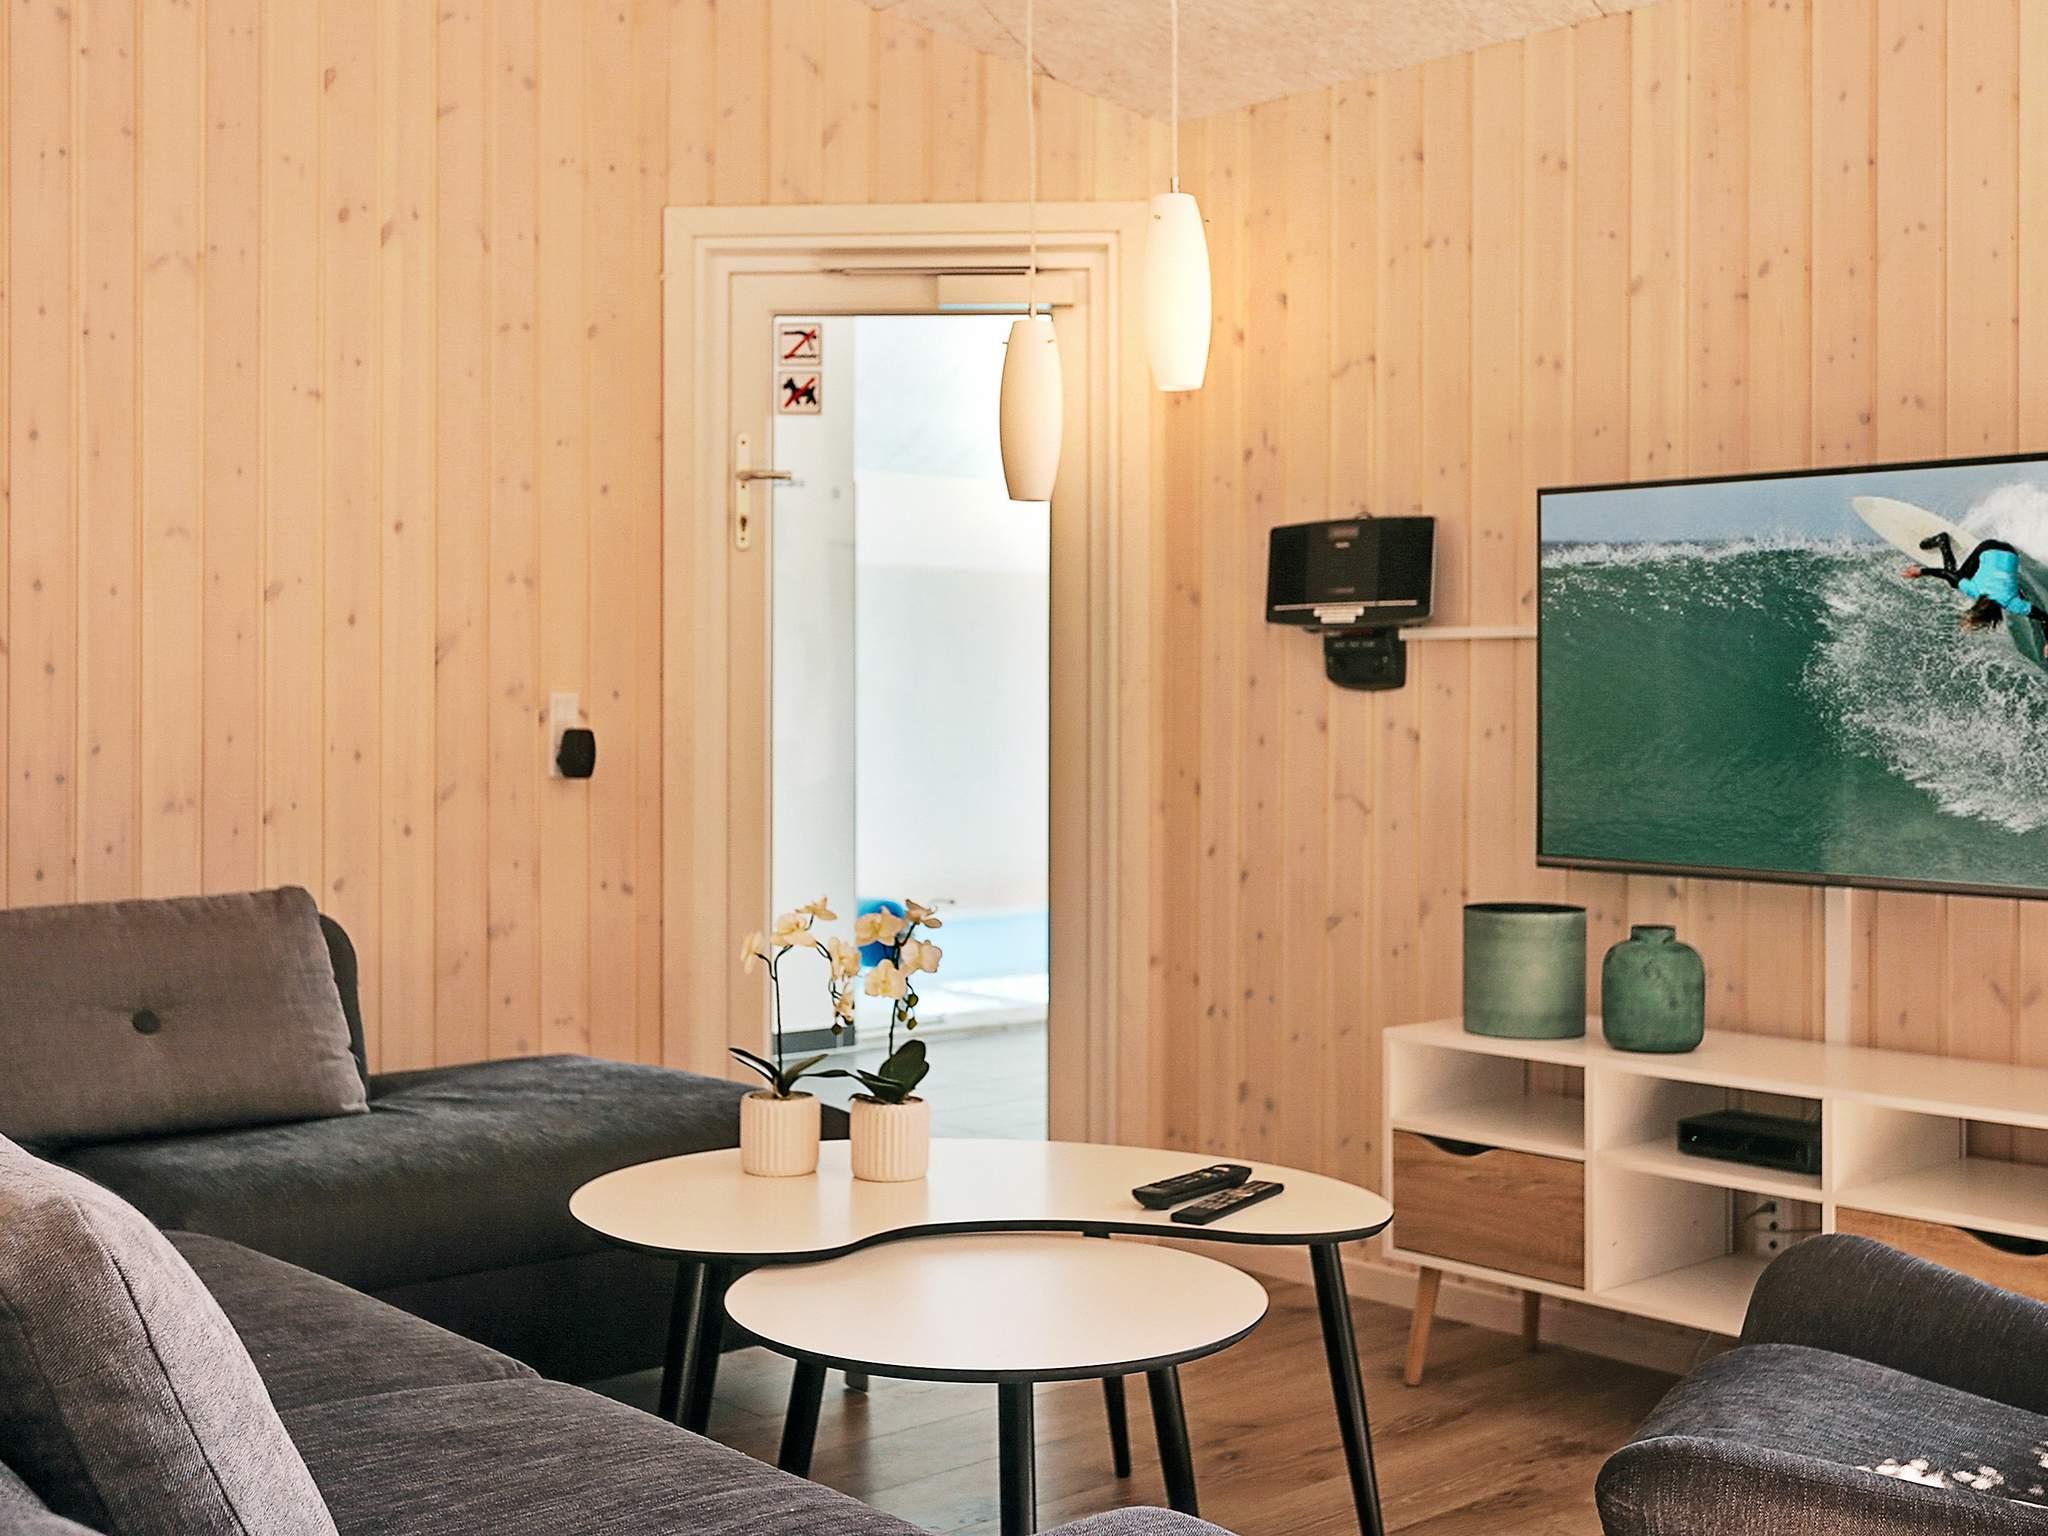 Ferienhaus Vejby Strand (1997272), Vejby, , Nordseeland, Dänemark, Bild 4